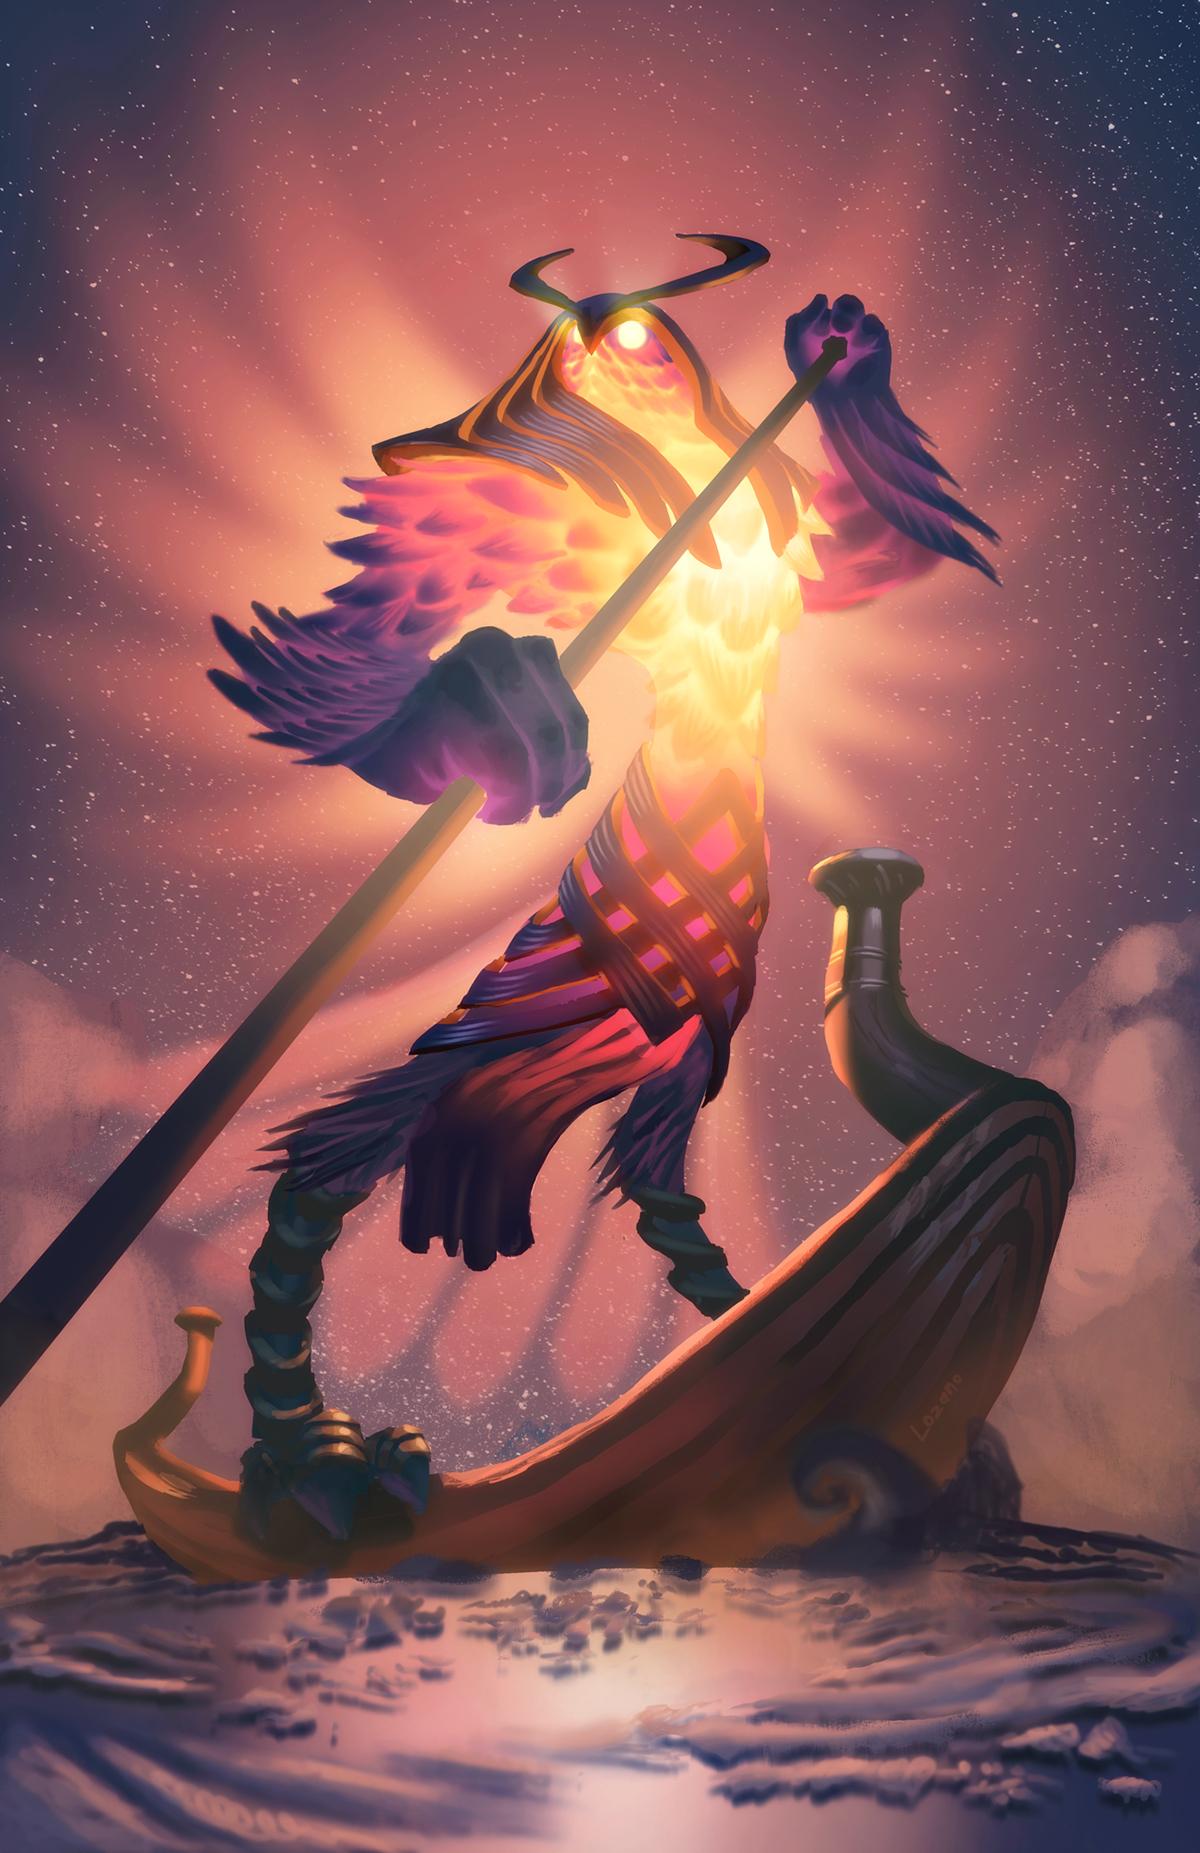 Ra-den - NPC - World of Warcraft